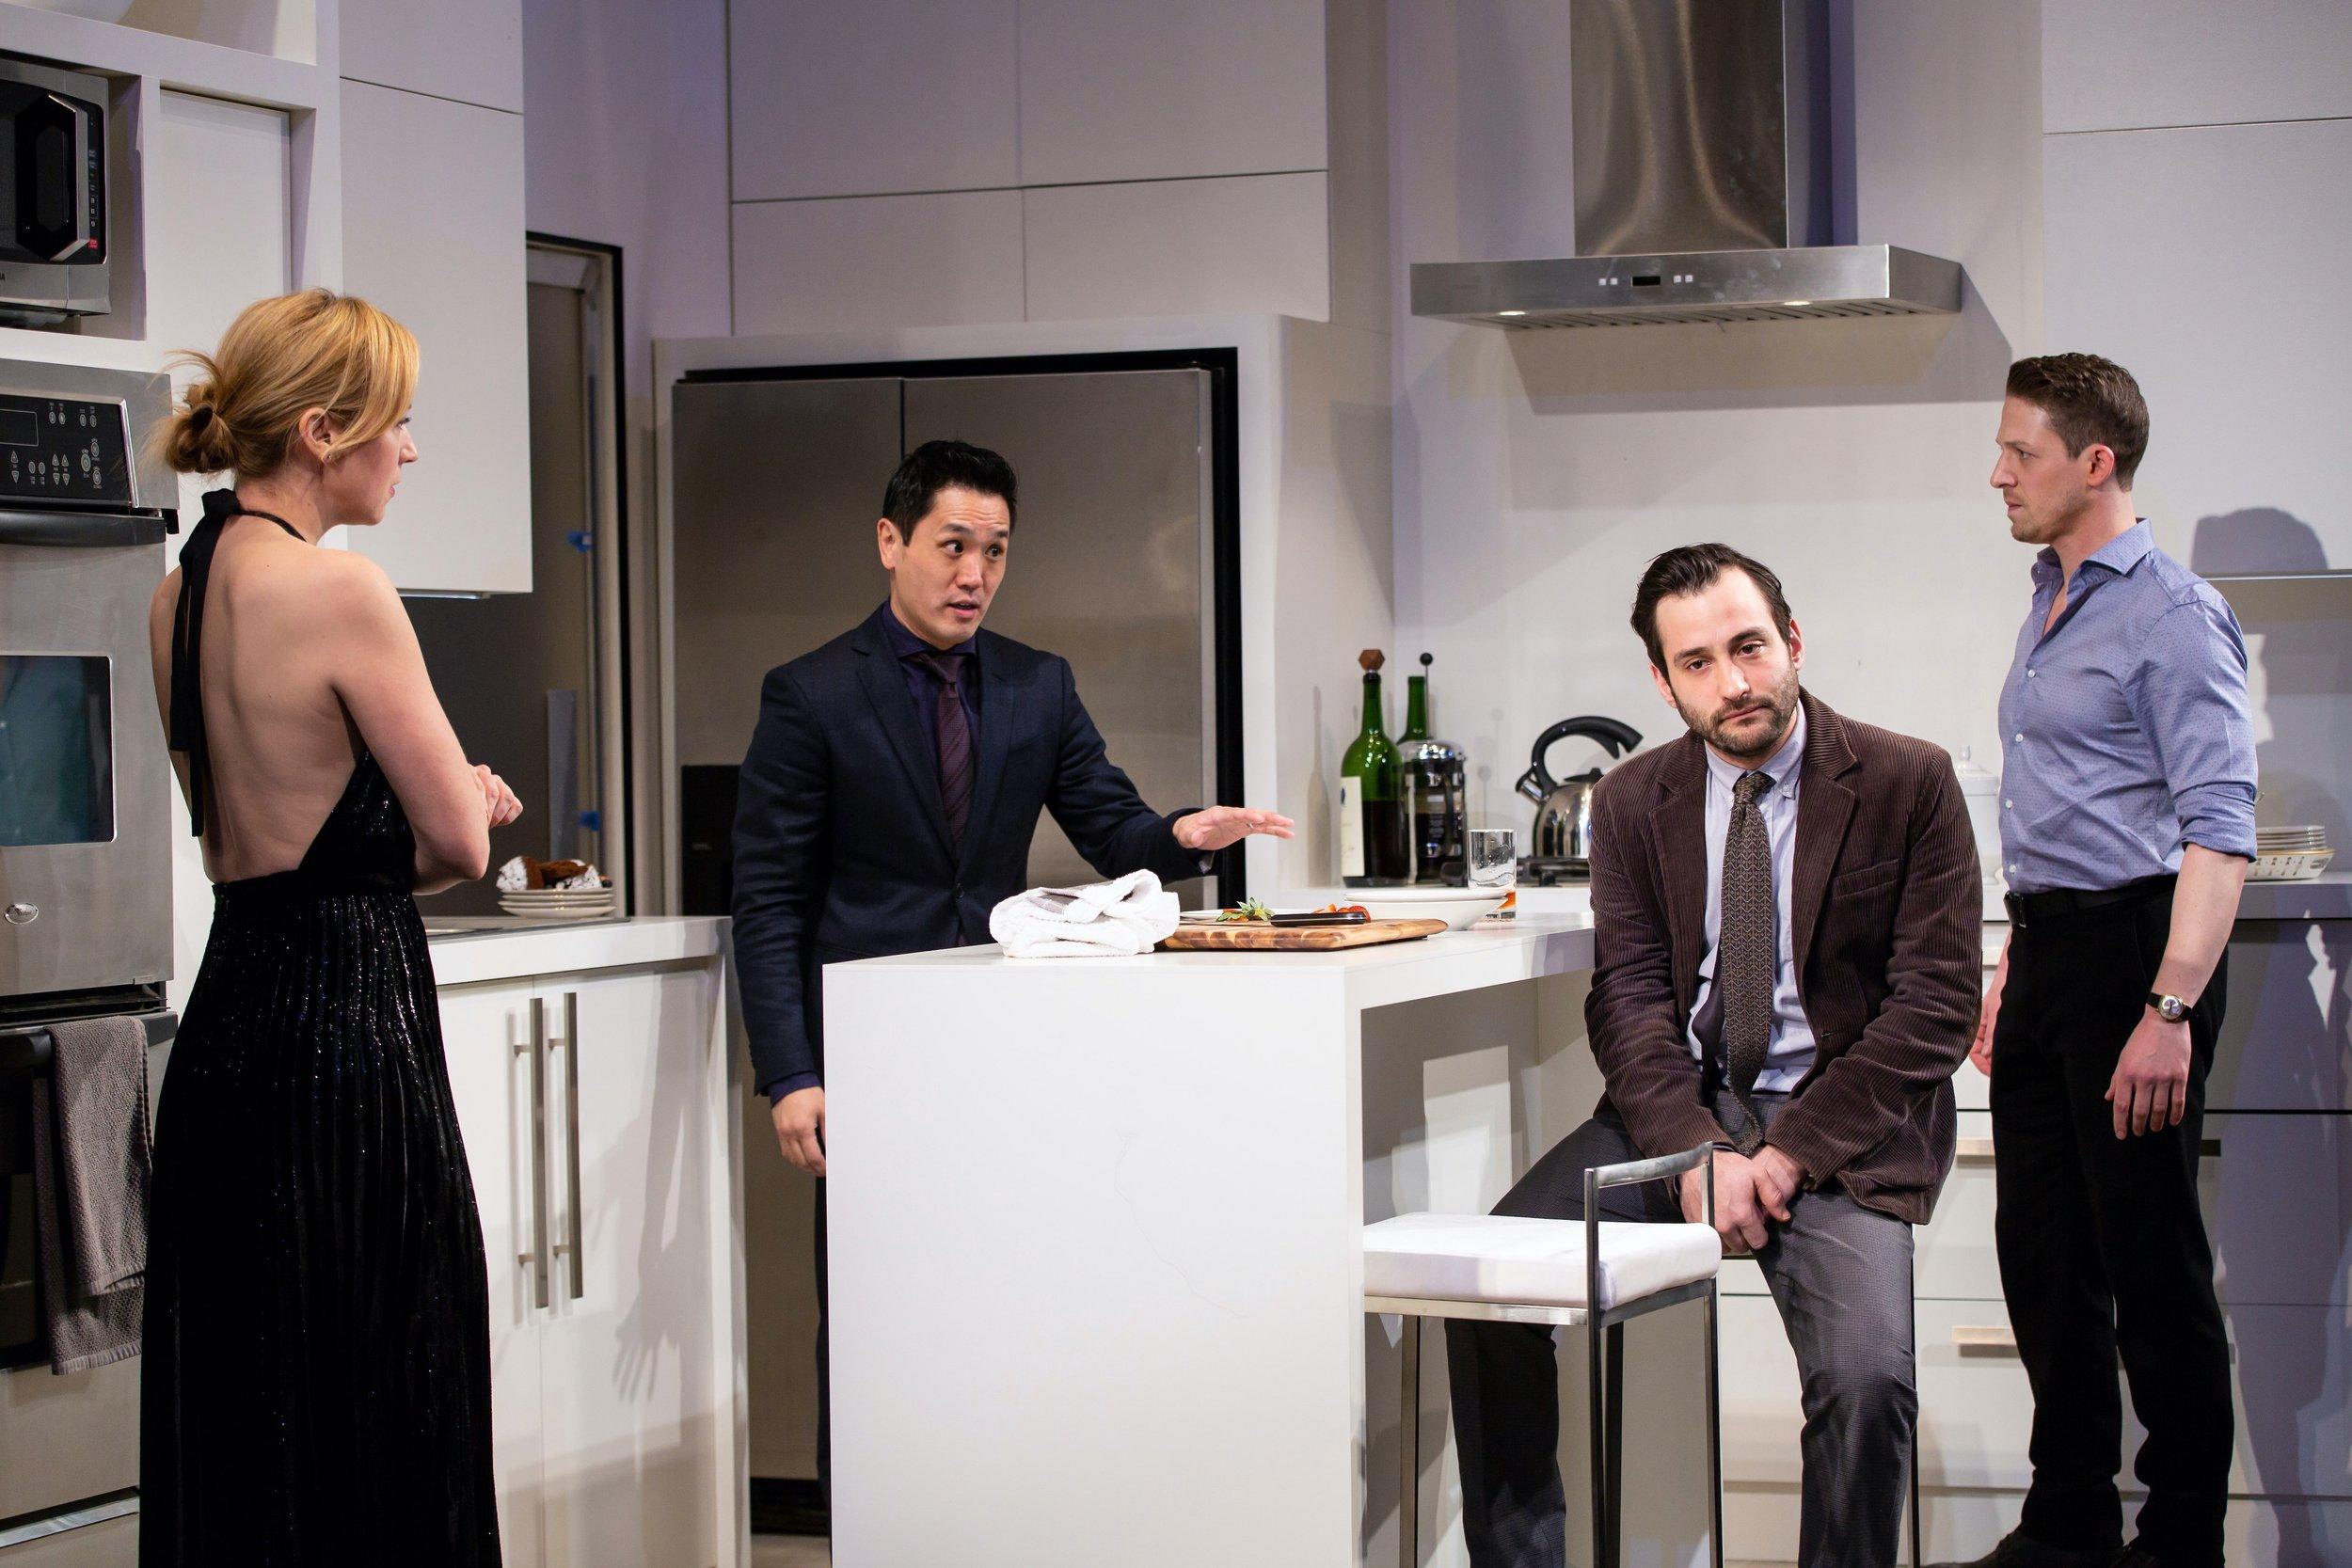 Katherine (Beth Riesgraf), Kai (Brian Lee Huynh), Alan (Teddy Bergman), Josh (Zach Appelman)